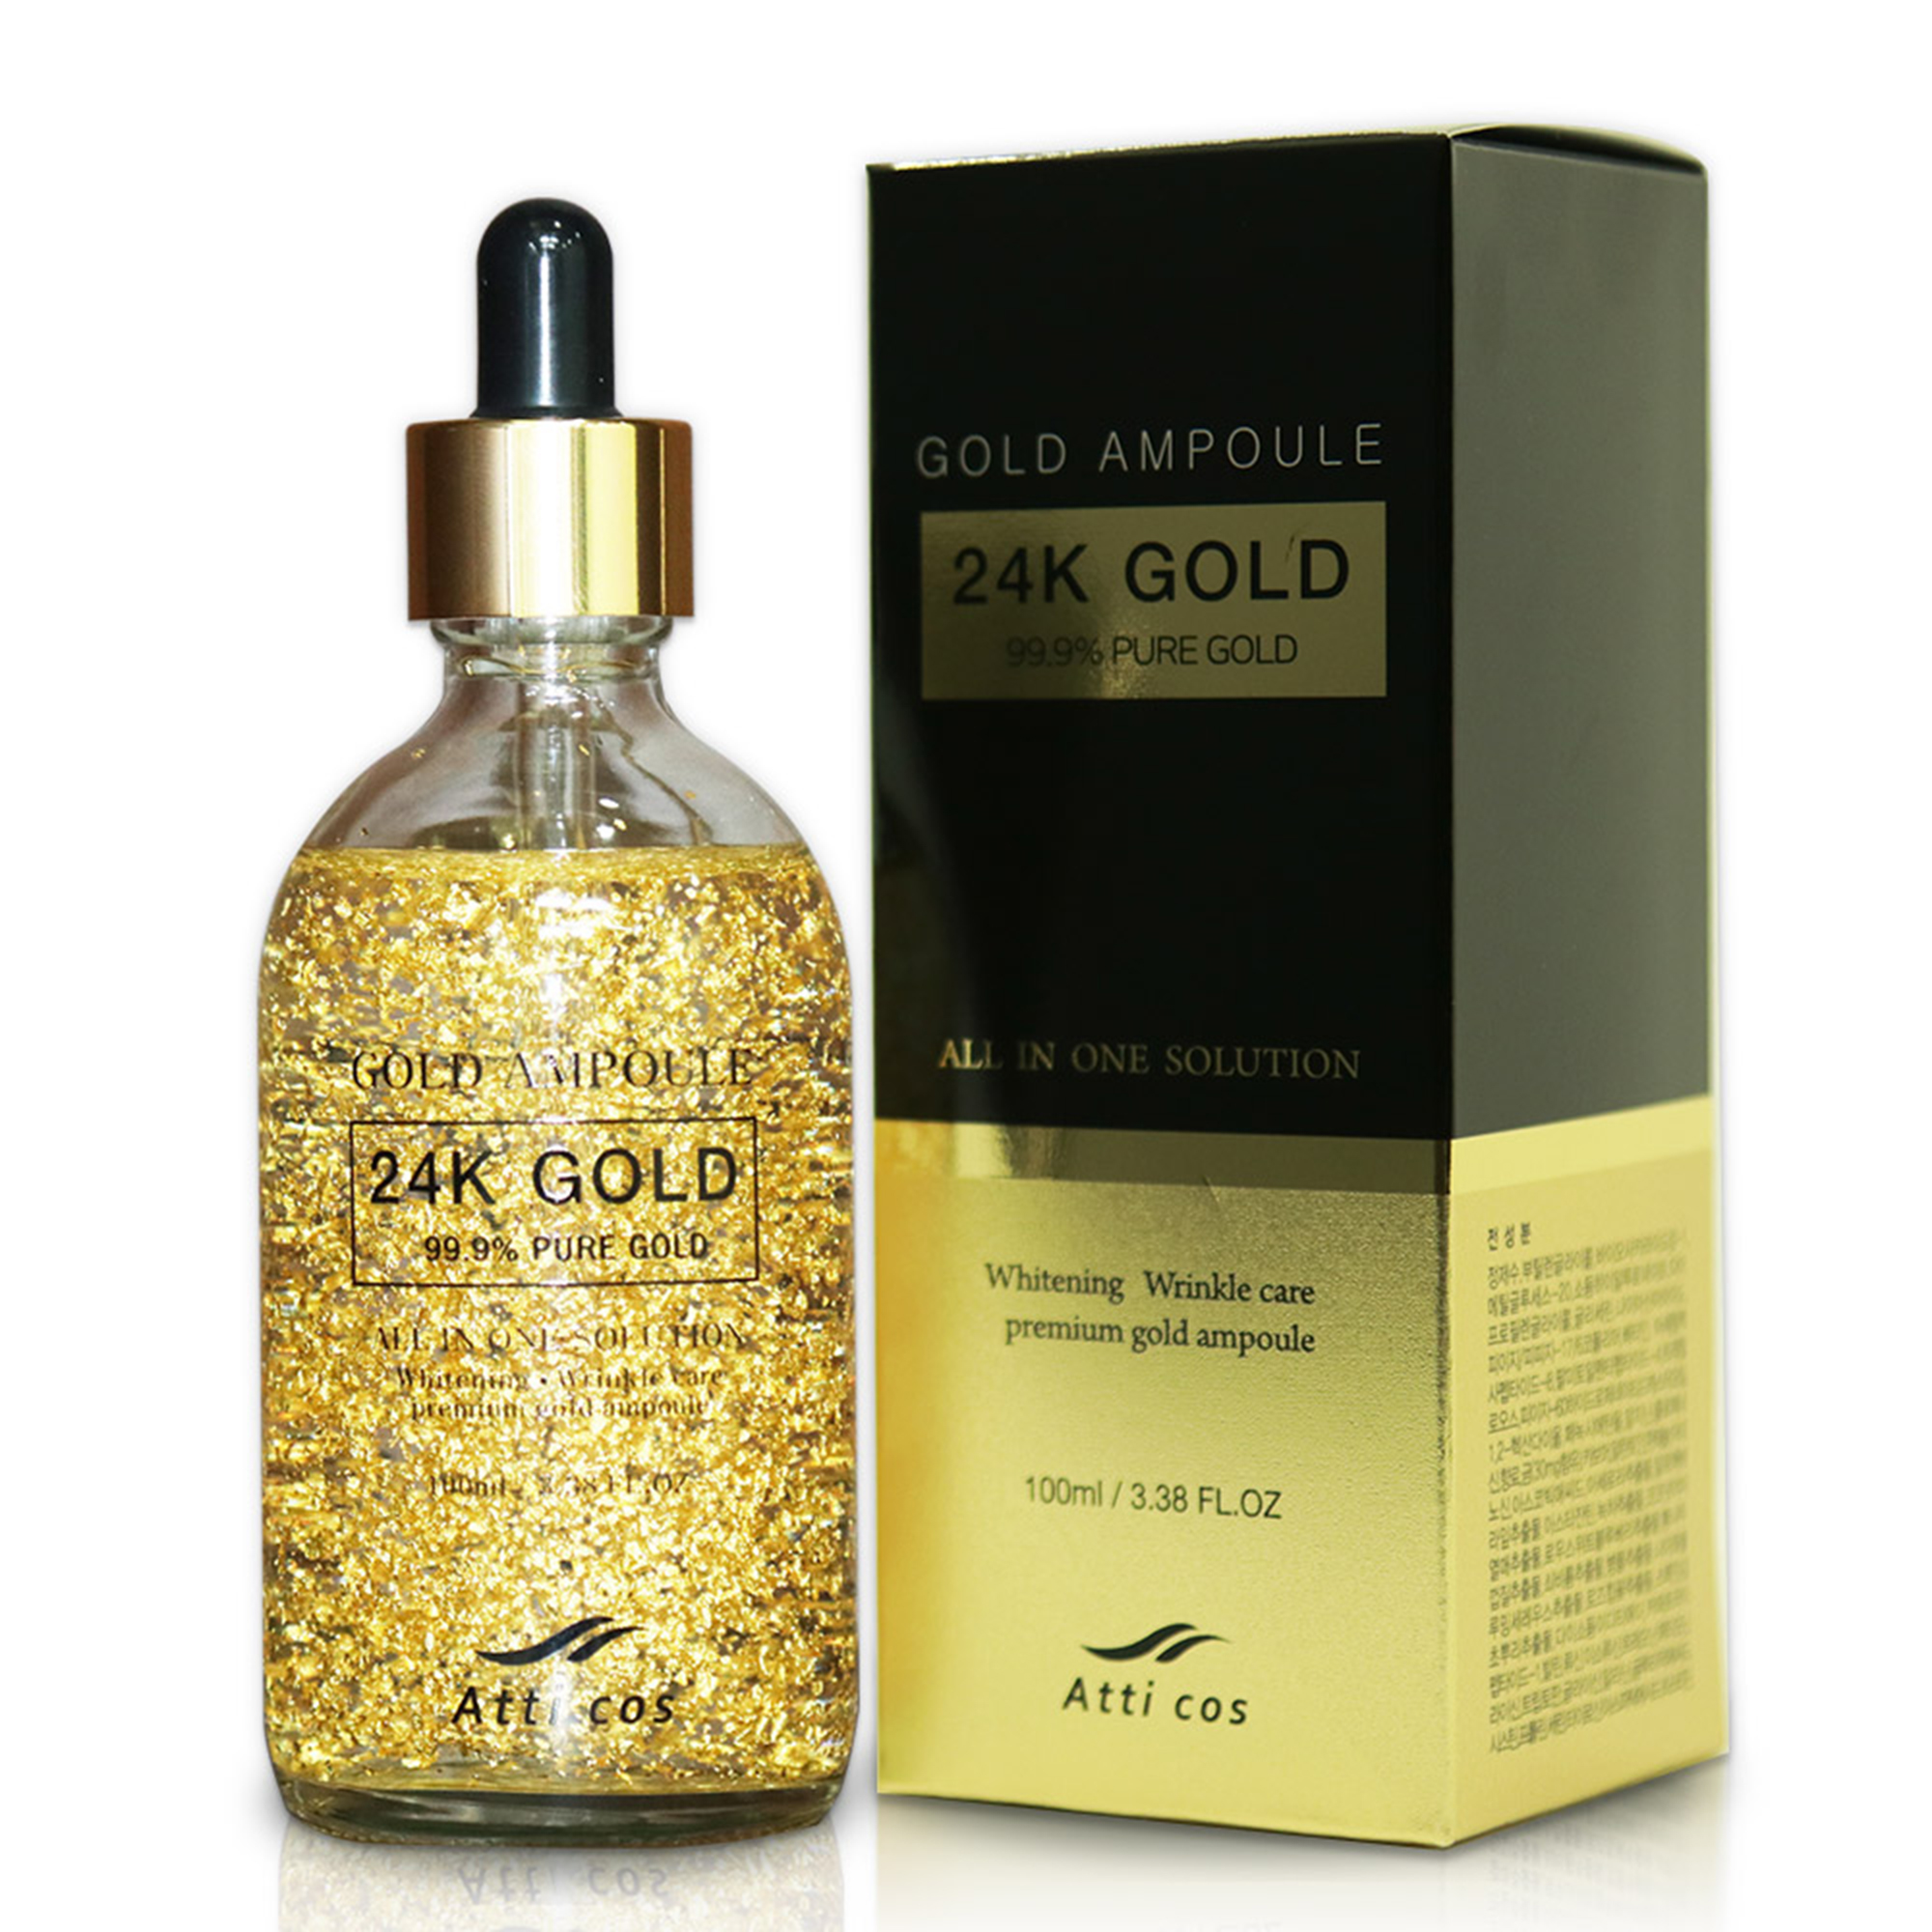 Serum dưỡng trắng Atticos 24K Gold Ampoule - 100ml